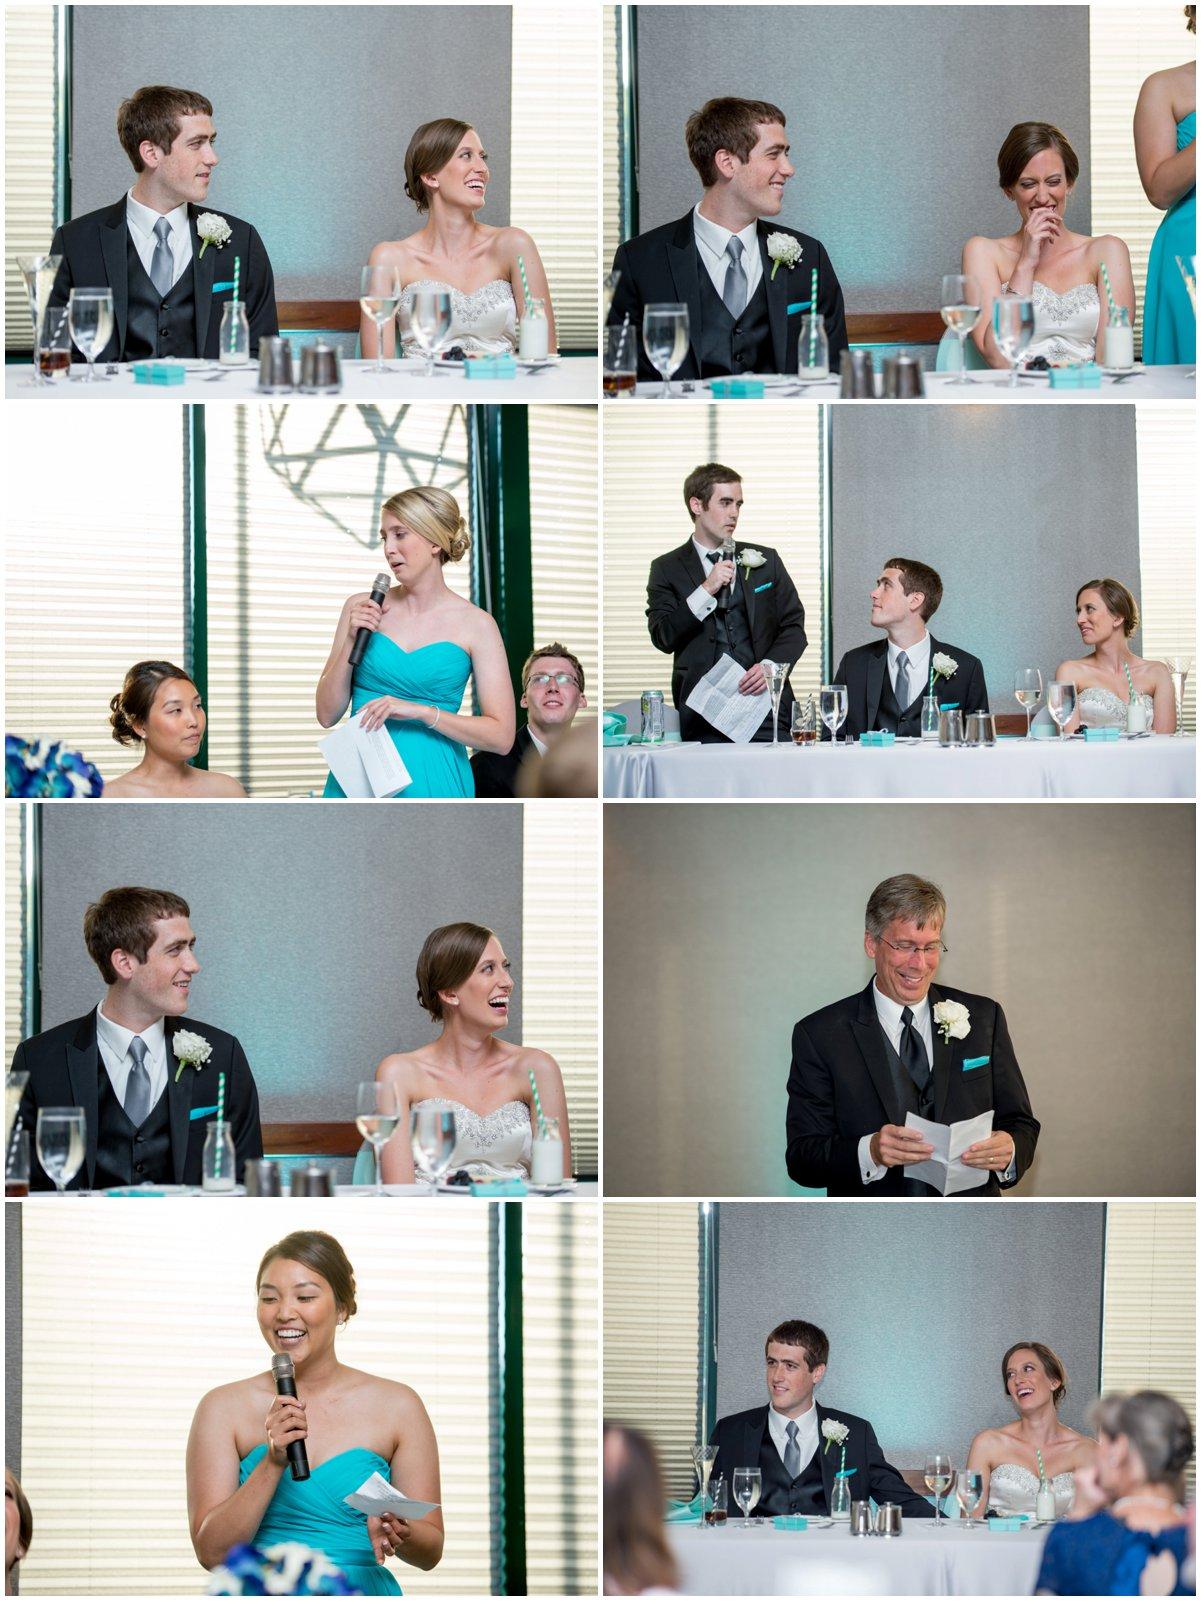 Mavris-wedding-pictures-Nate-Crouch-021.jpg